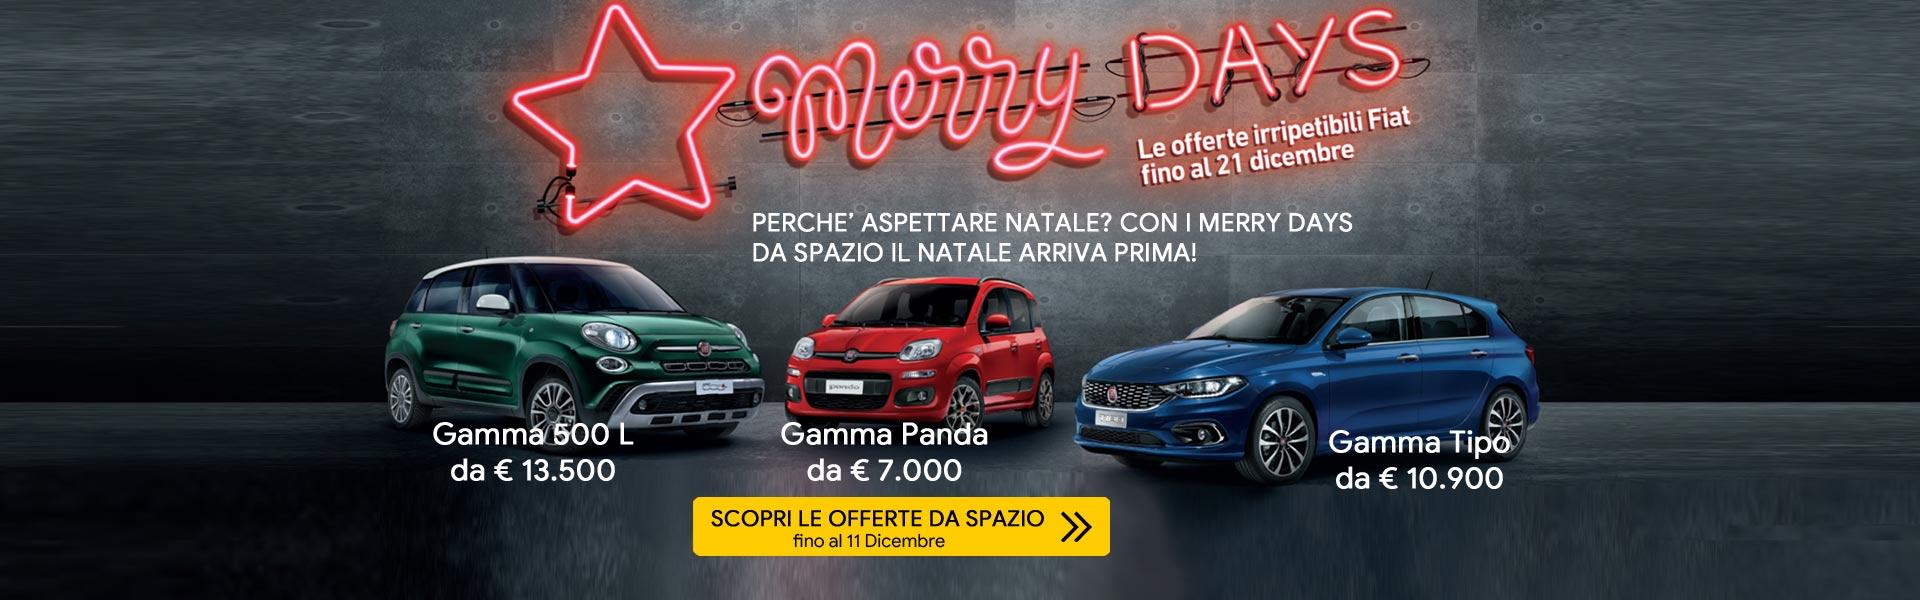 Merry Days su gamma Fiat